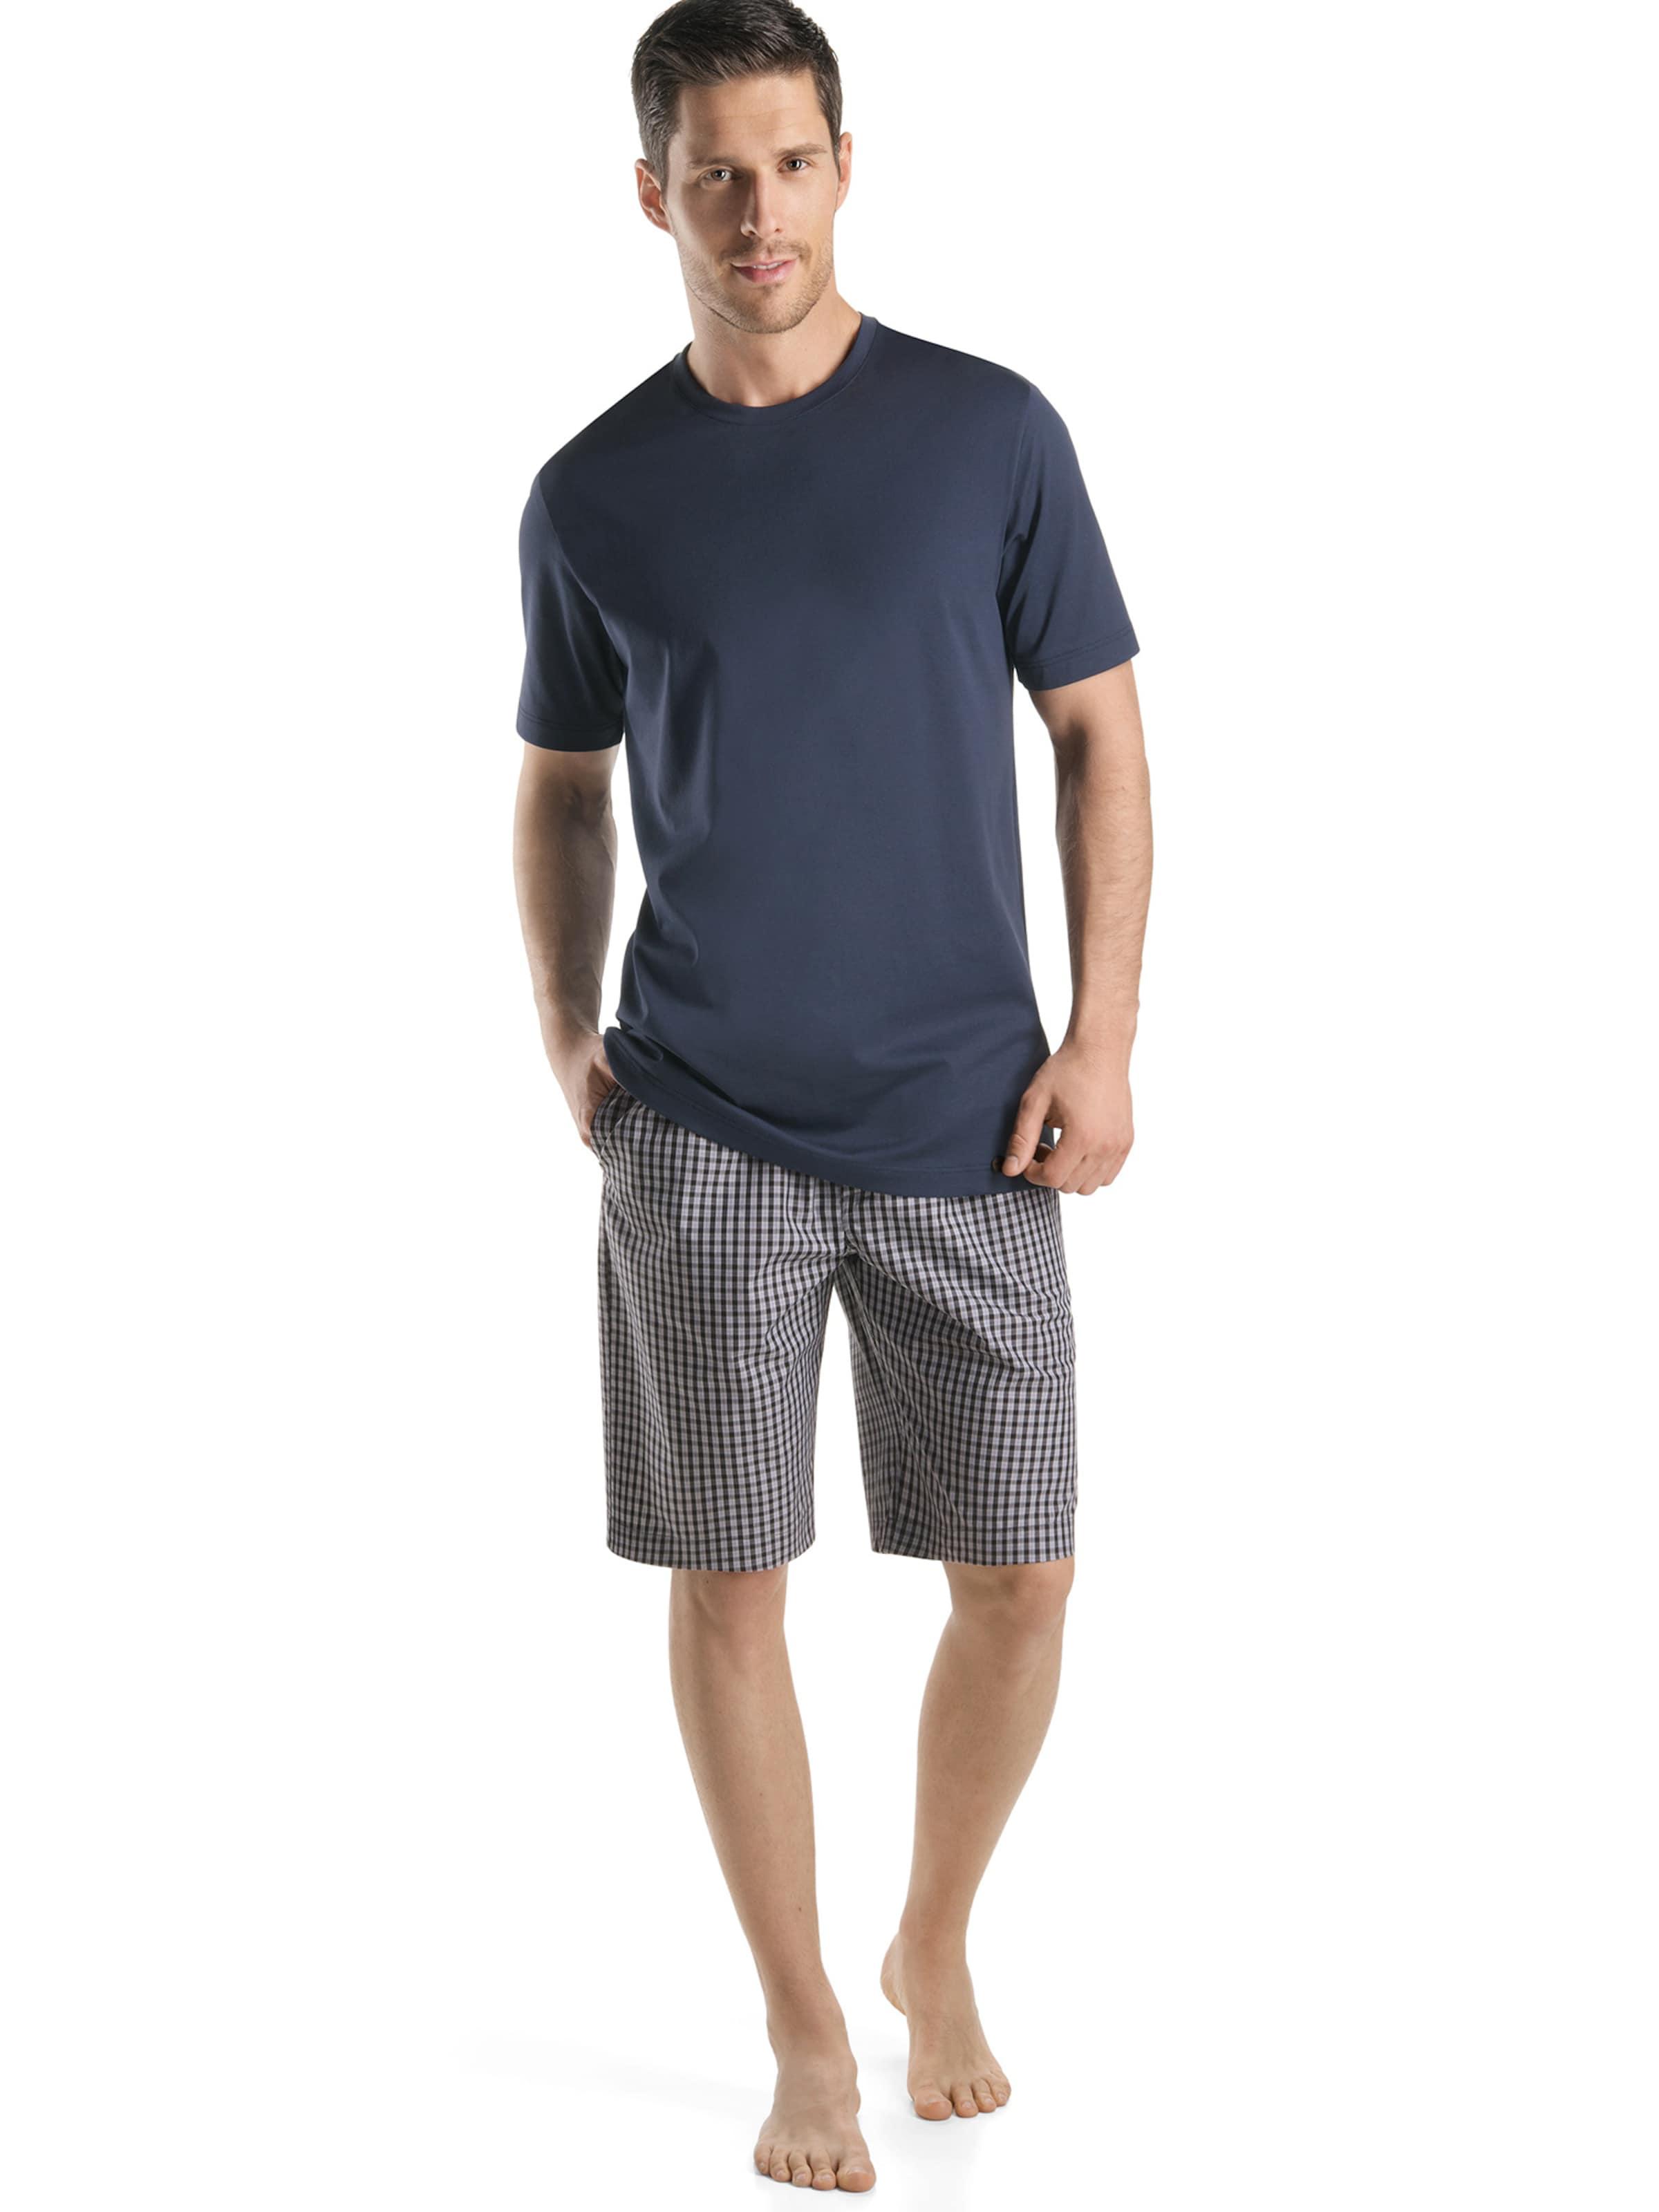 Hanro T-Shirt ' Day & Night ' in rauchblau Unifarben 45350